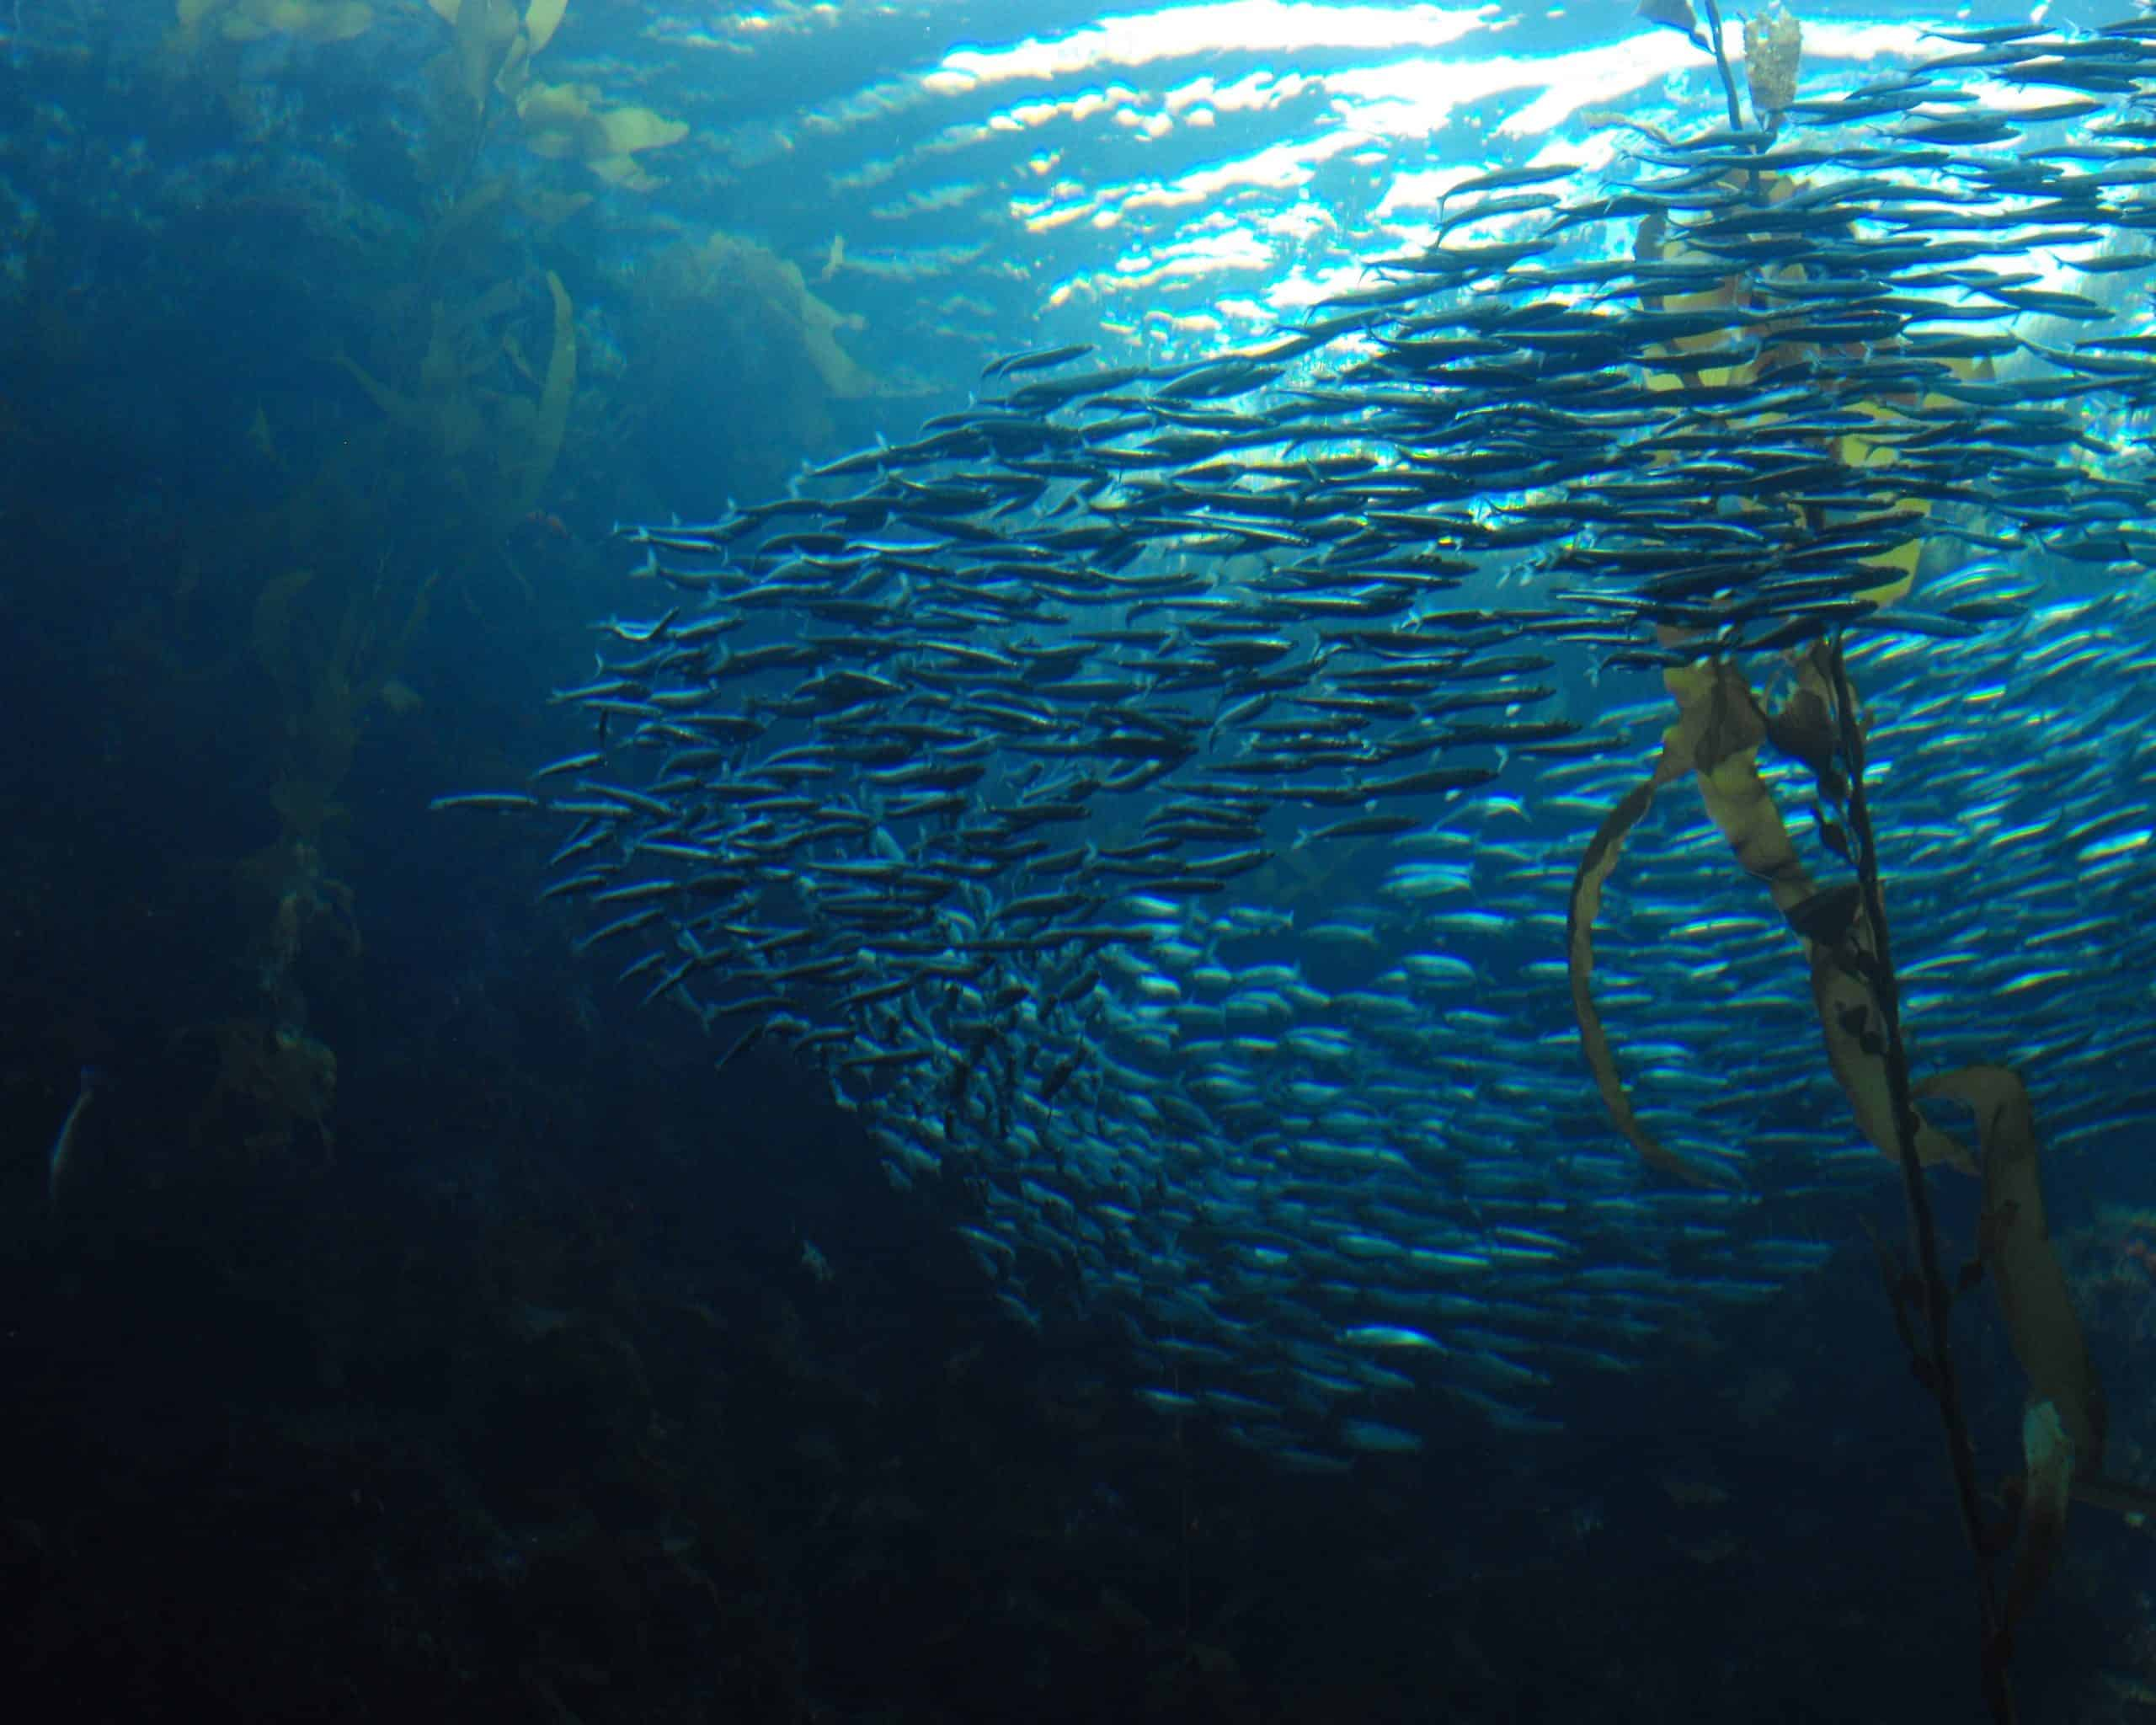 mumuration, schooling fish,